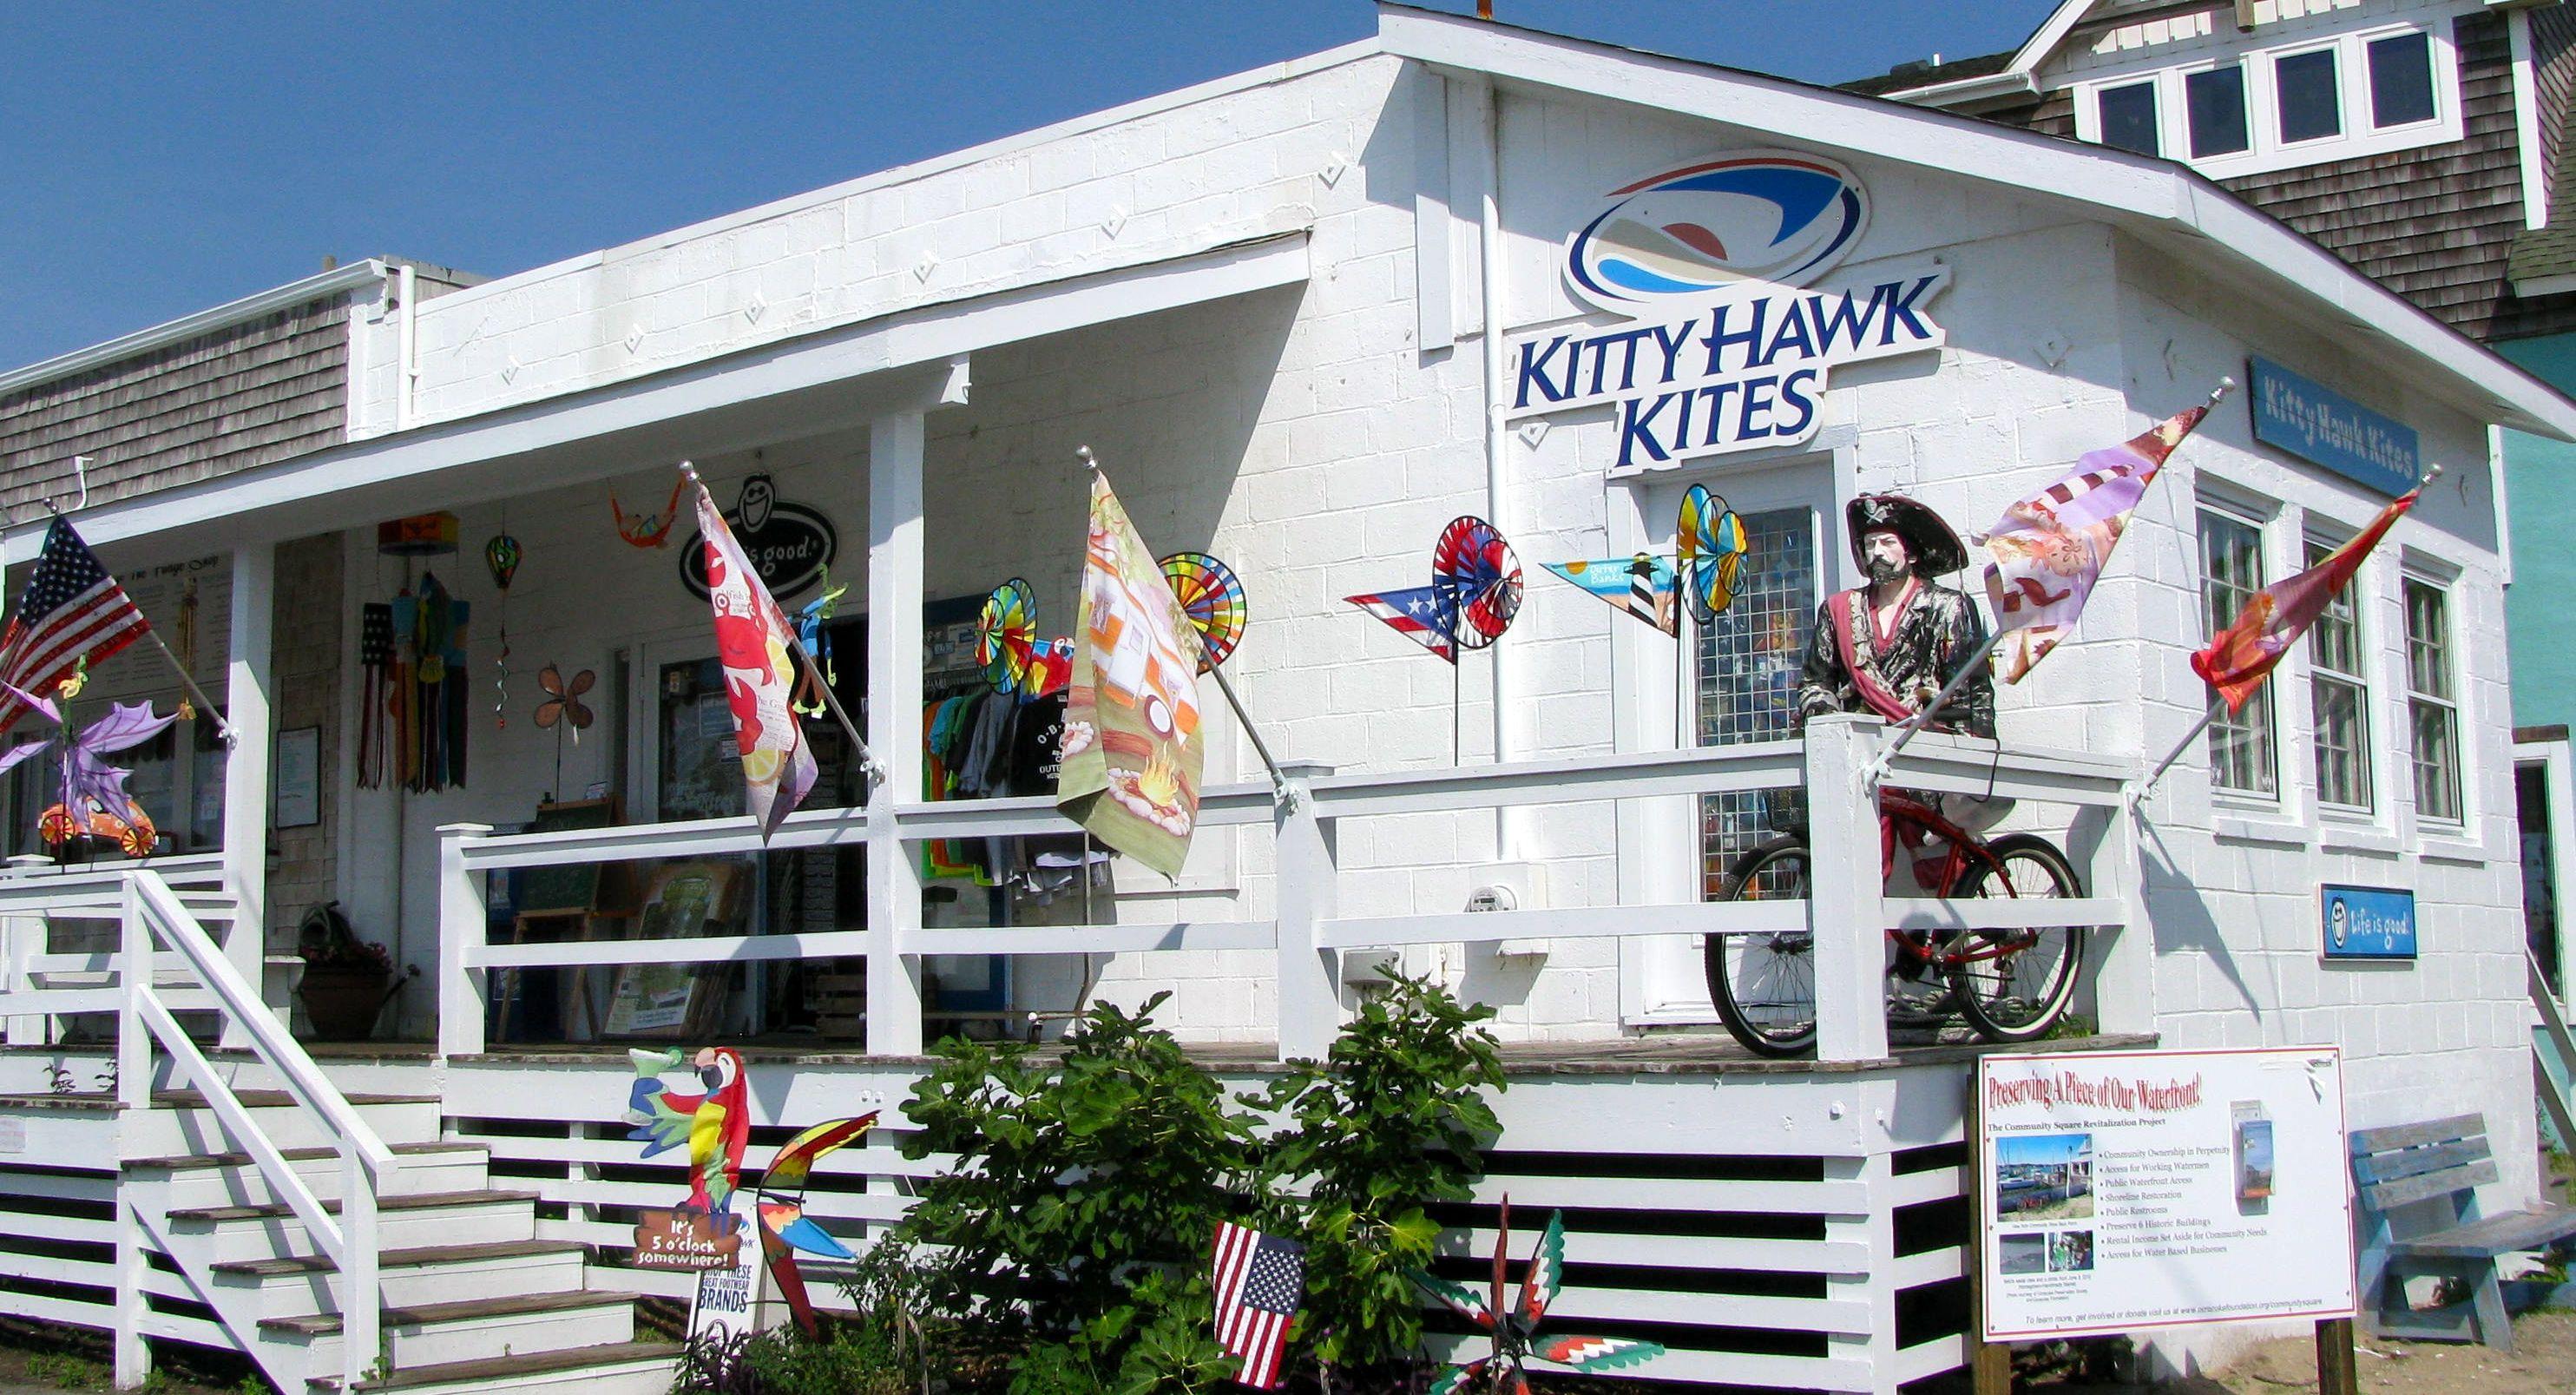 Kitty Hawk Kites Kitty hawk kites, Kitty hawk, Kite